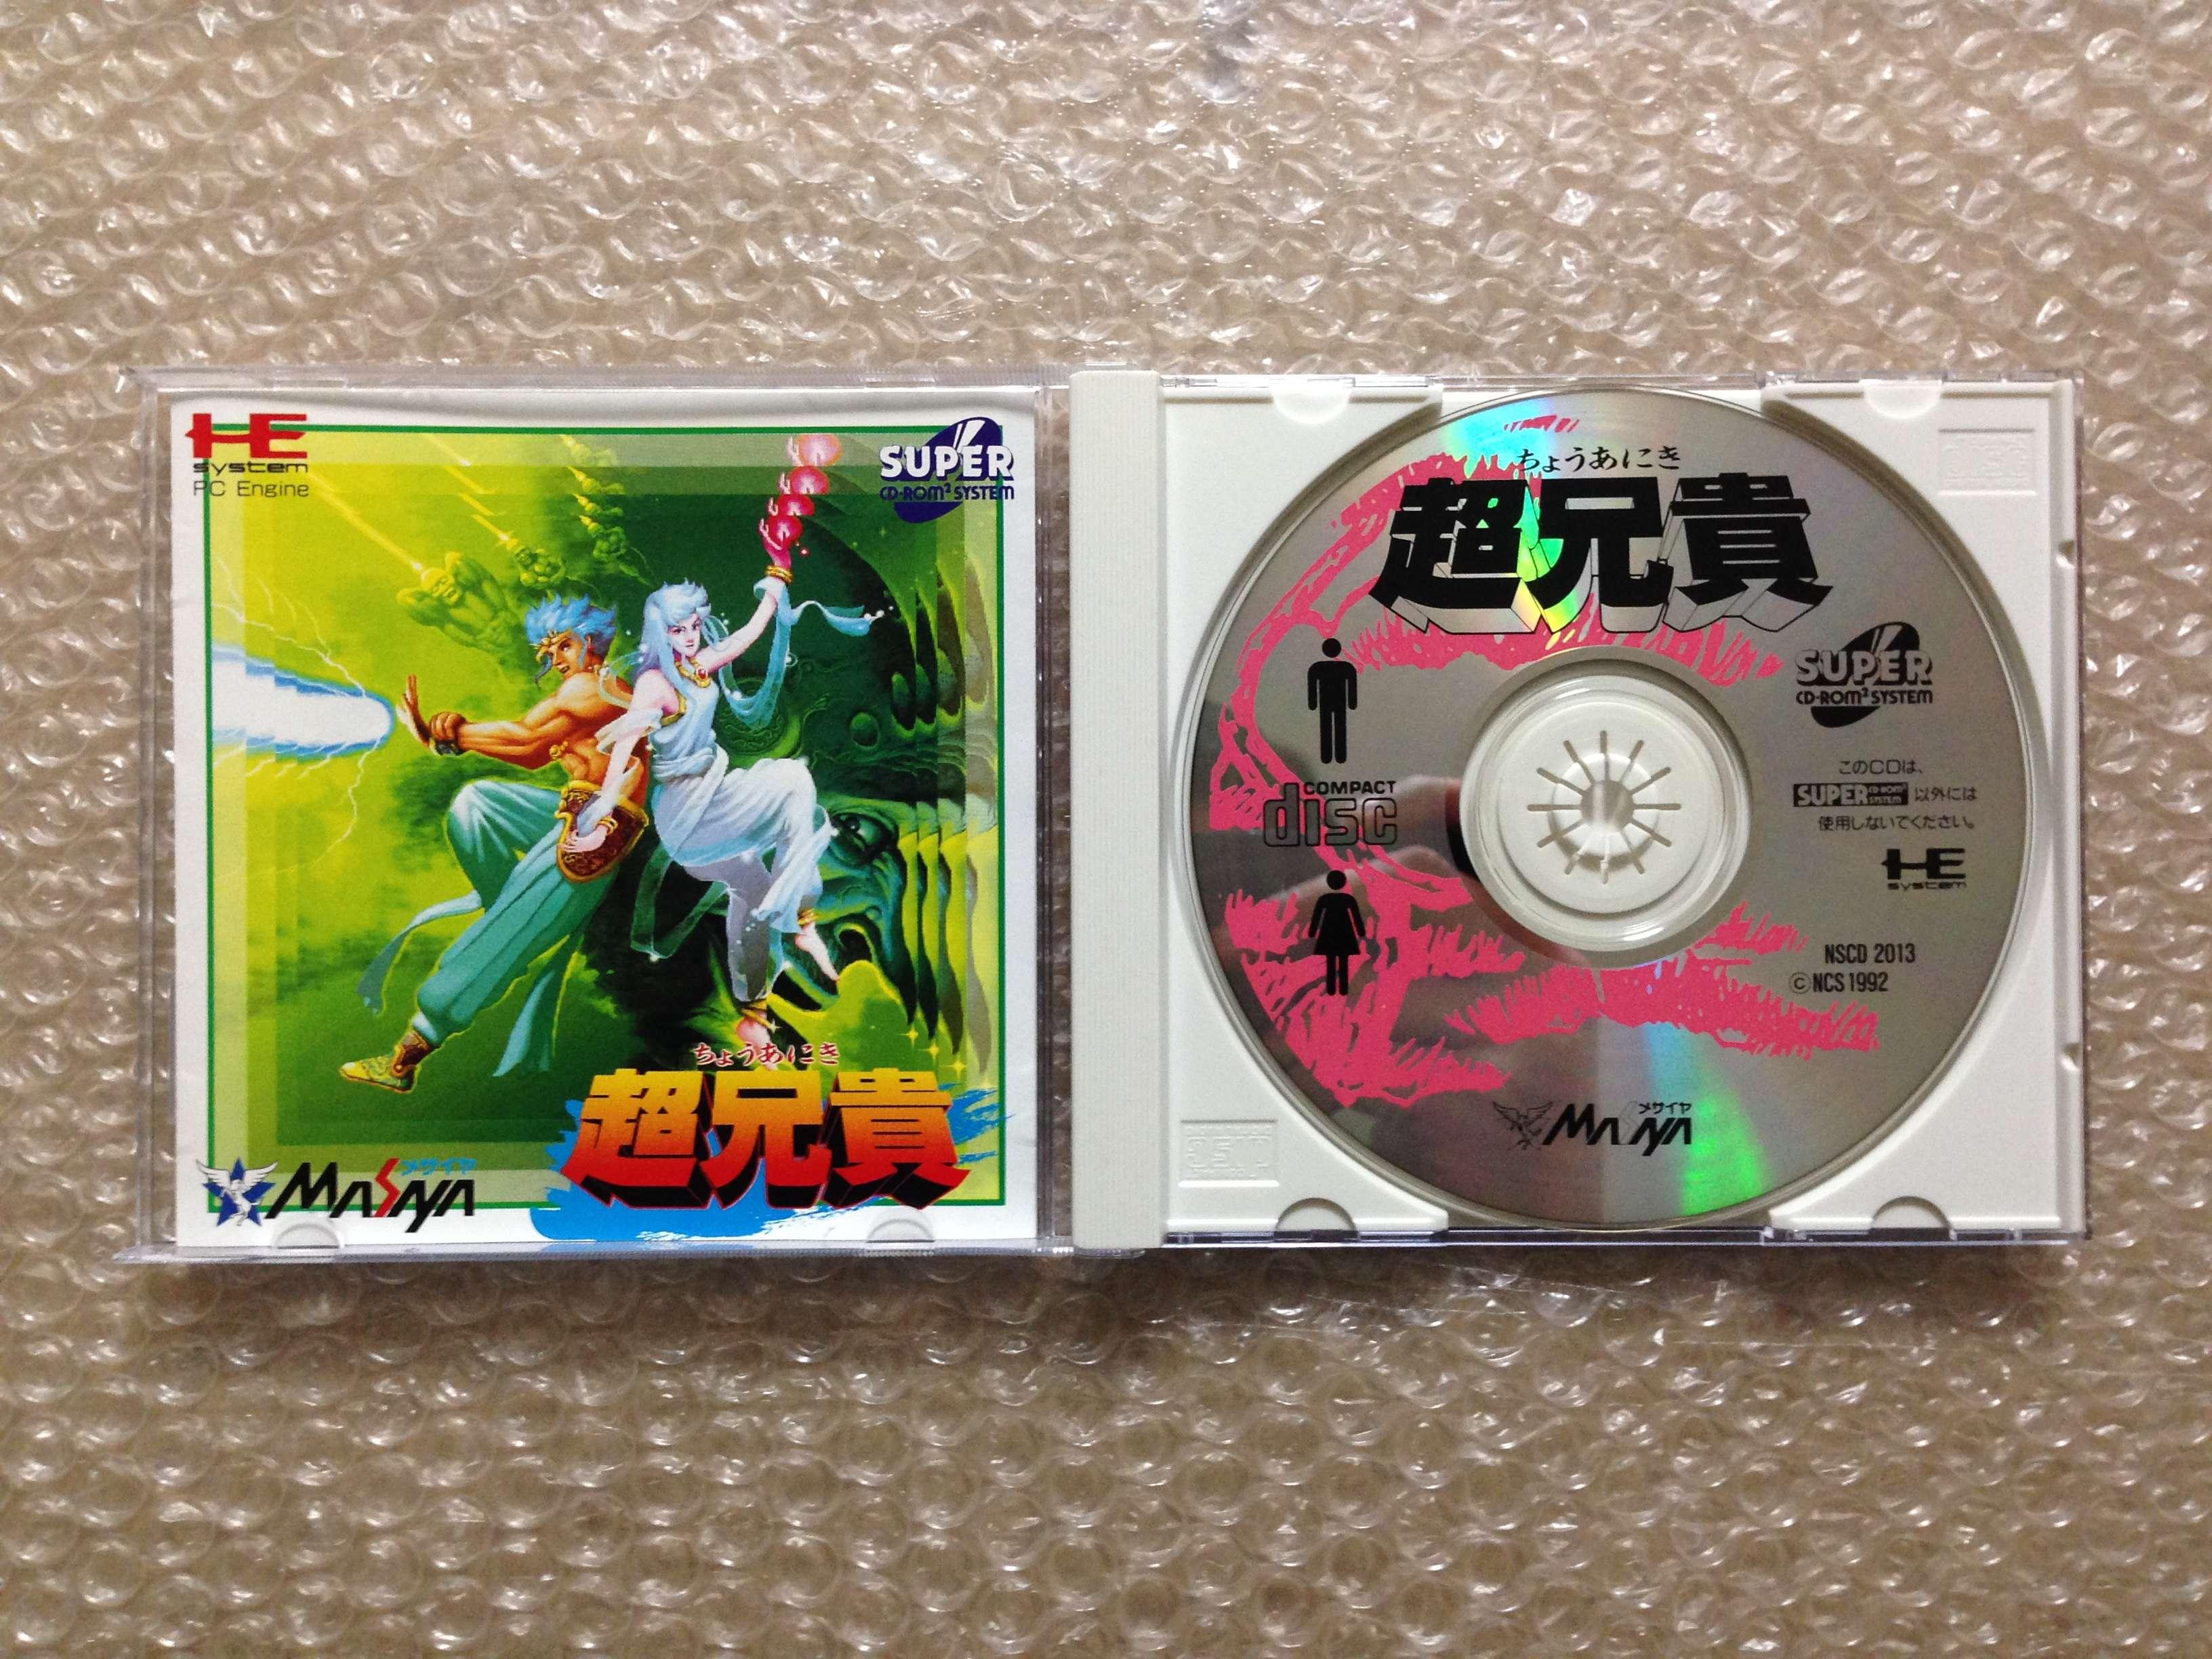 PC Engine Super CD